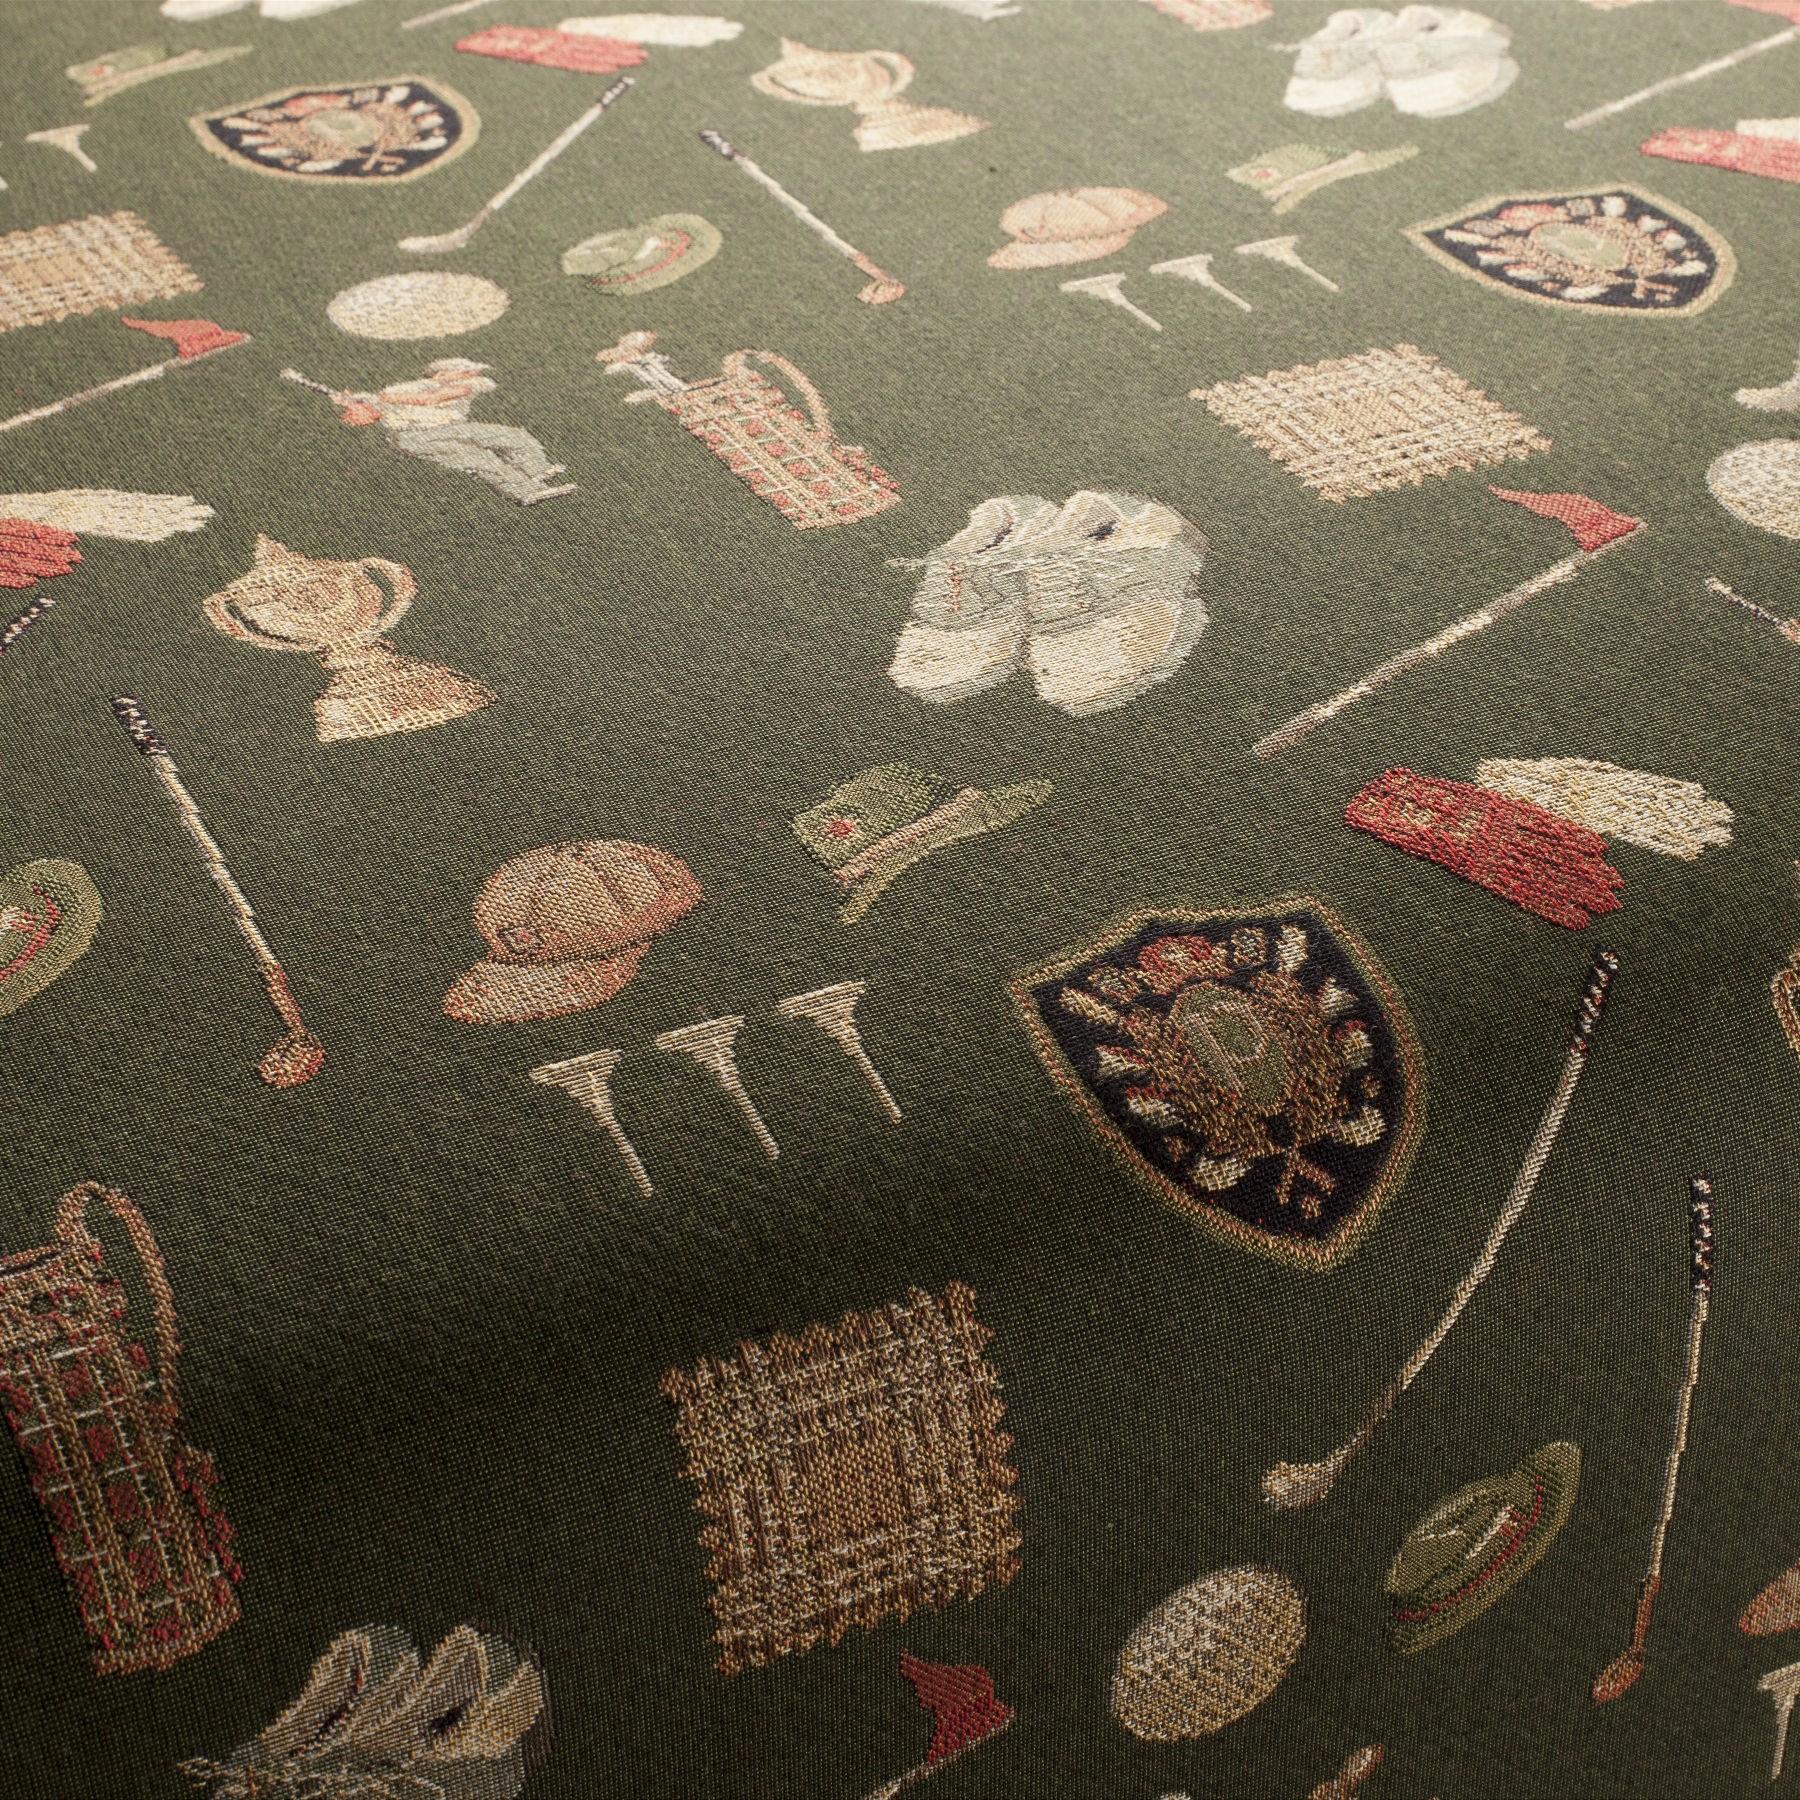 upholstery fabric fairway 9 2205 030 jab anstoetz fabrics. Black Bedroom Furniture Sets. Home Design Ideas